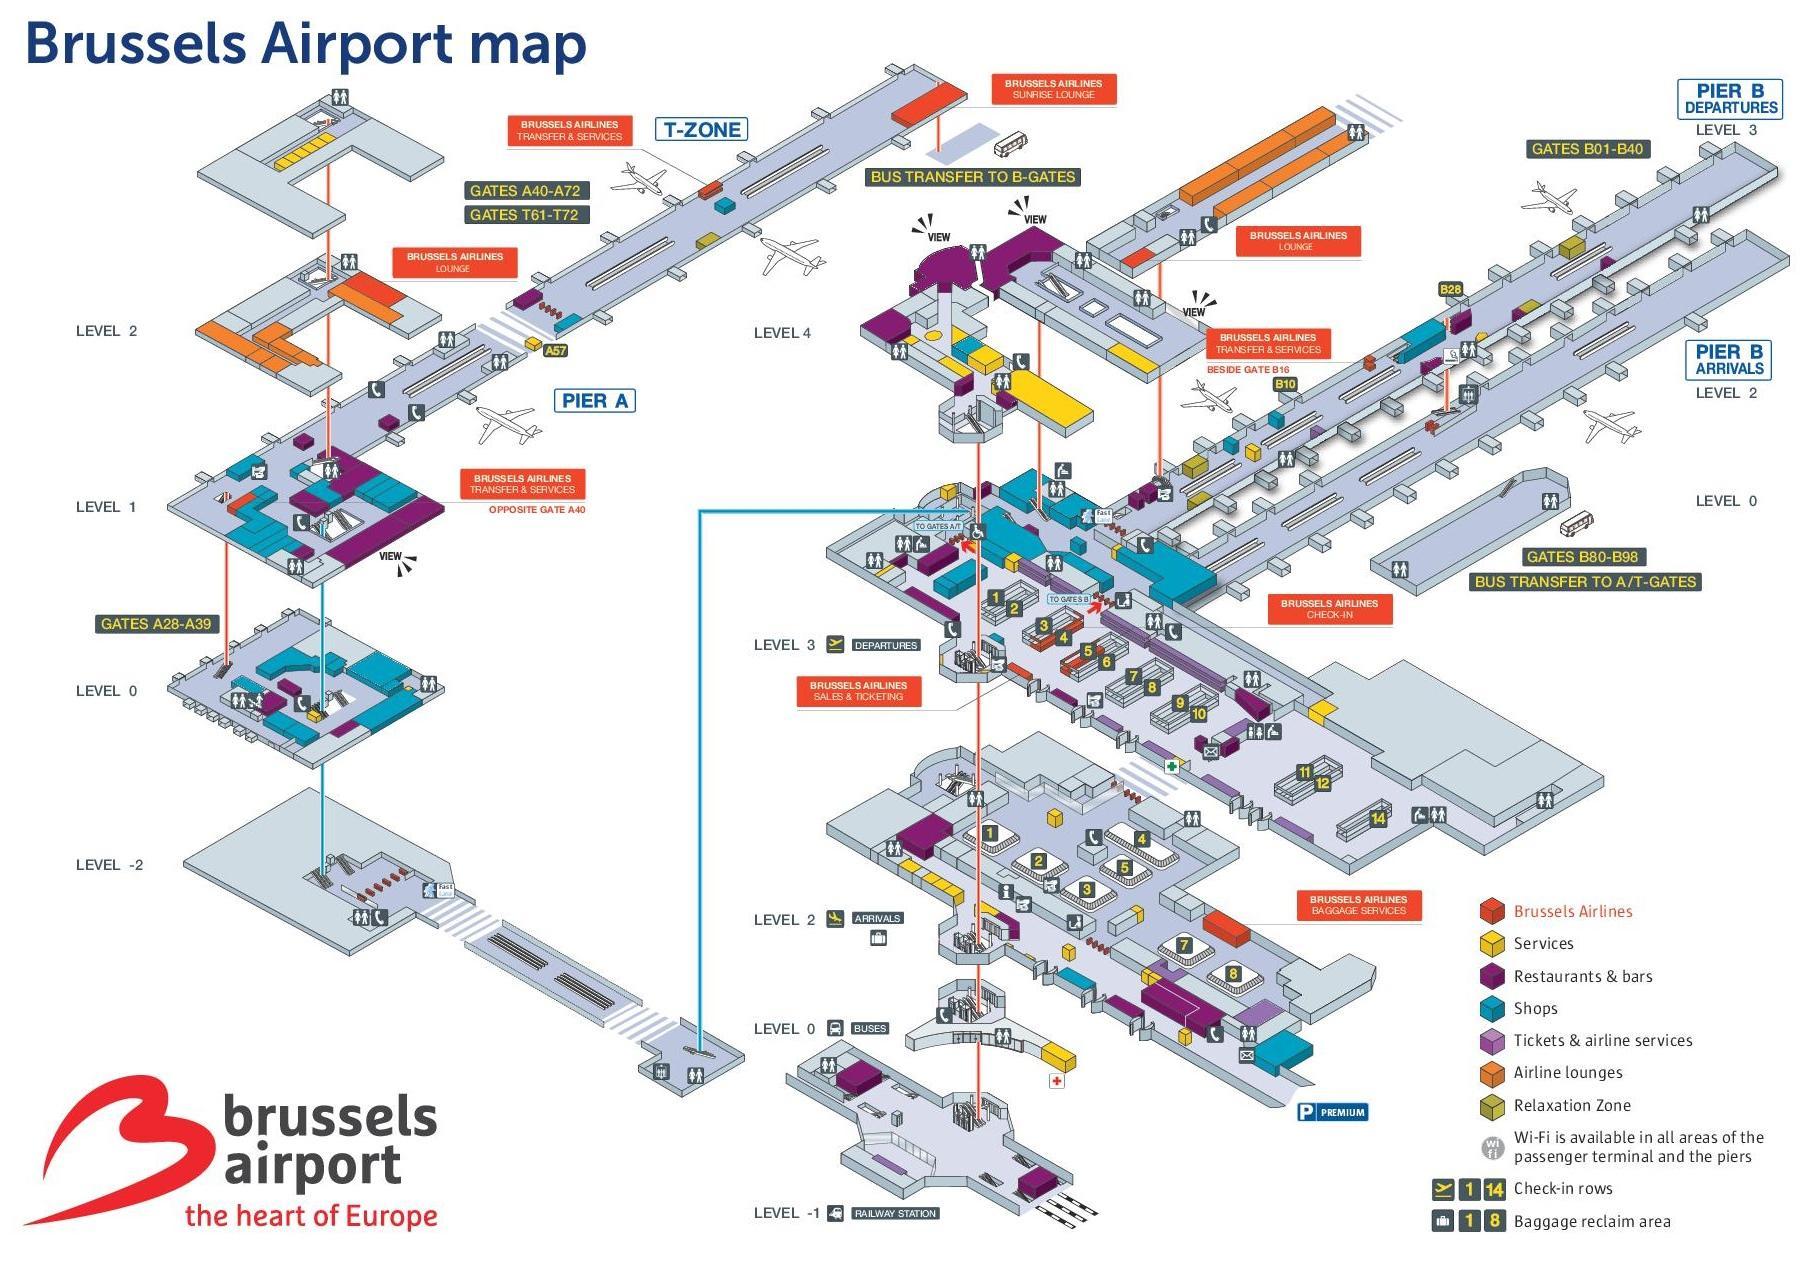 Brysselin Lentokentta Kartta Bryssel Lentokentta Kartta Belgia